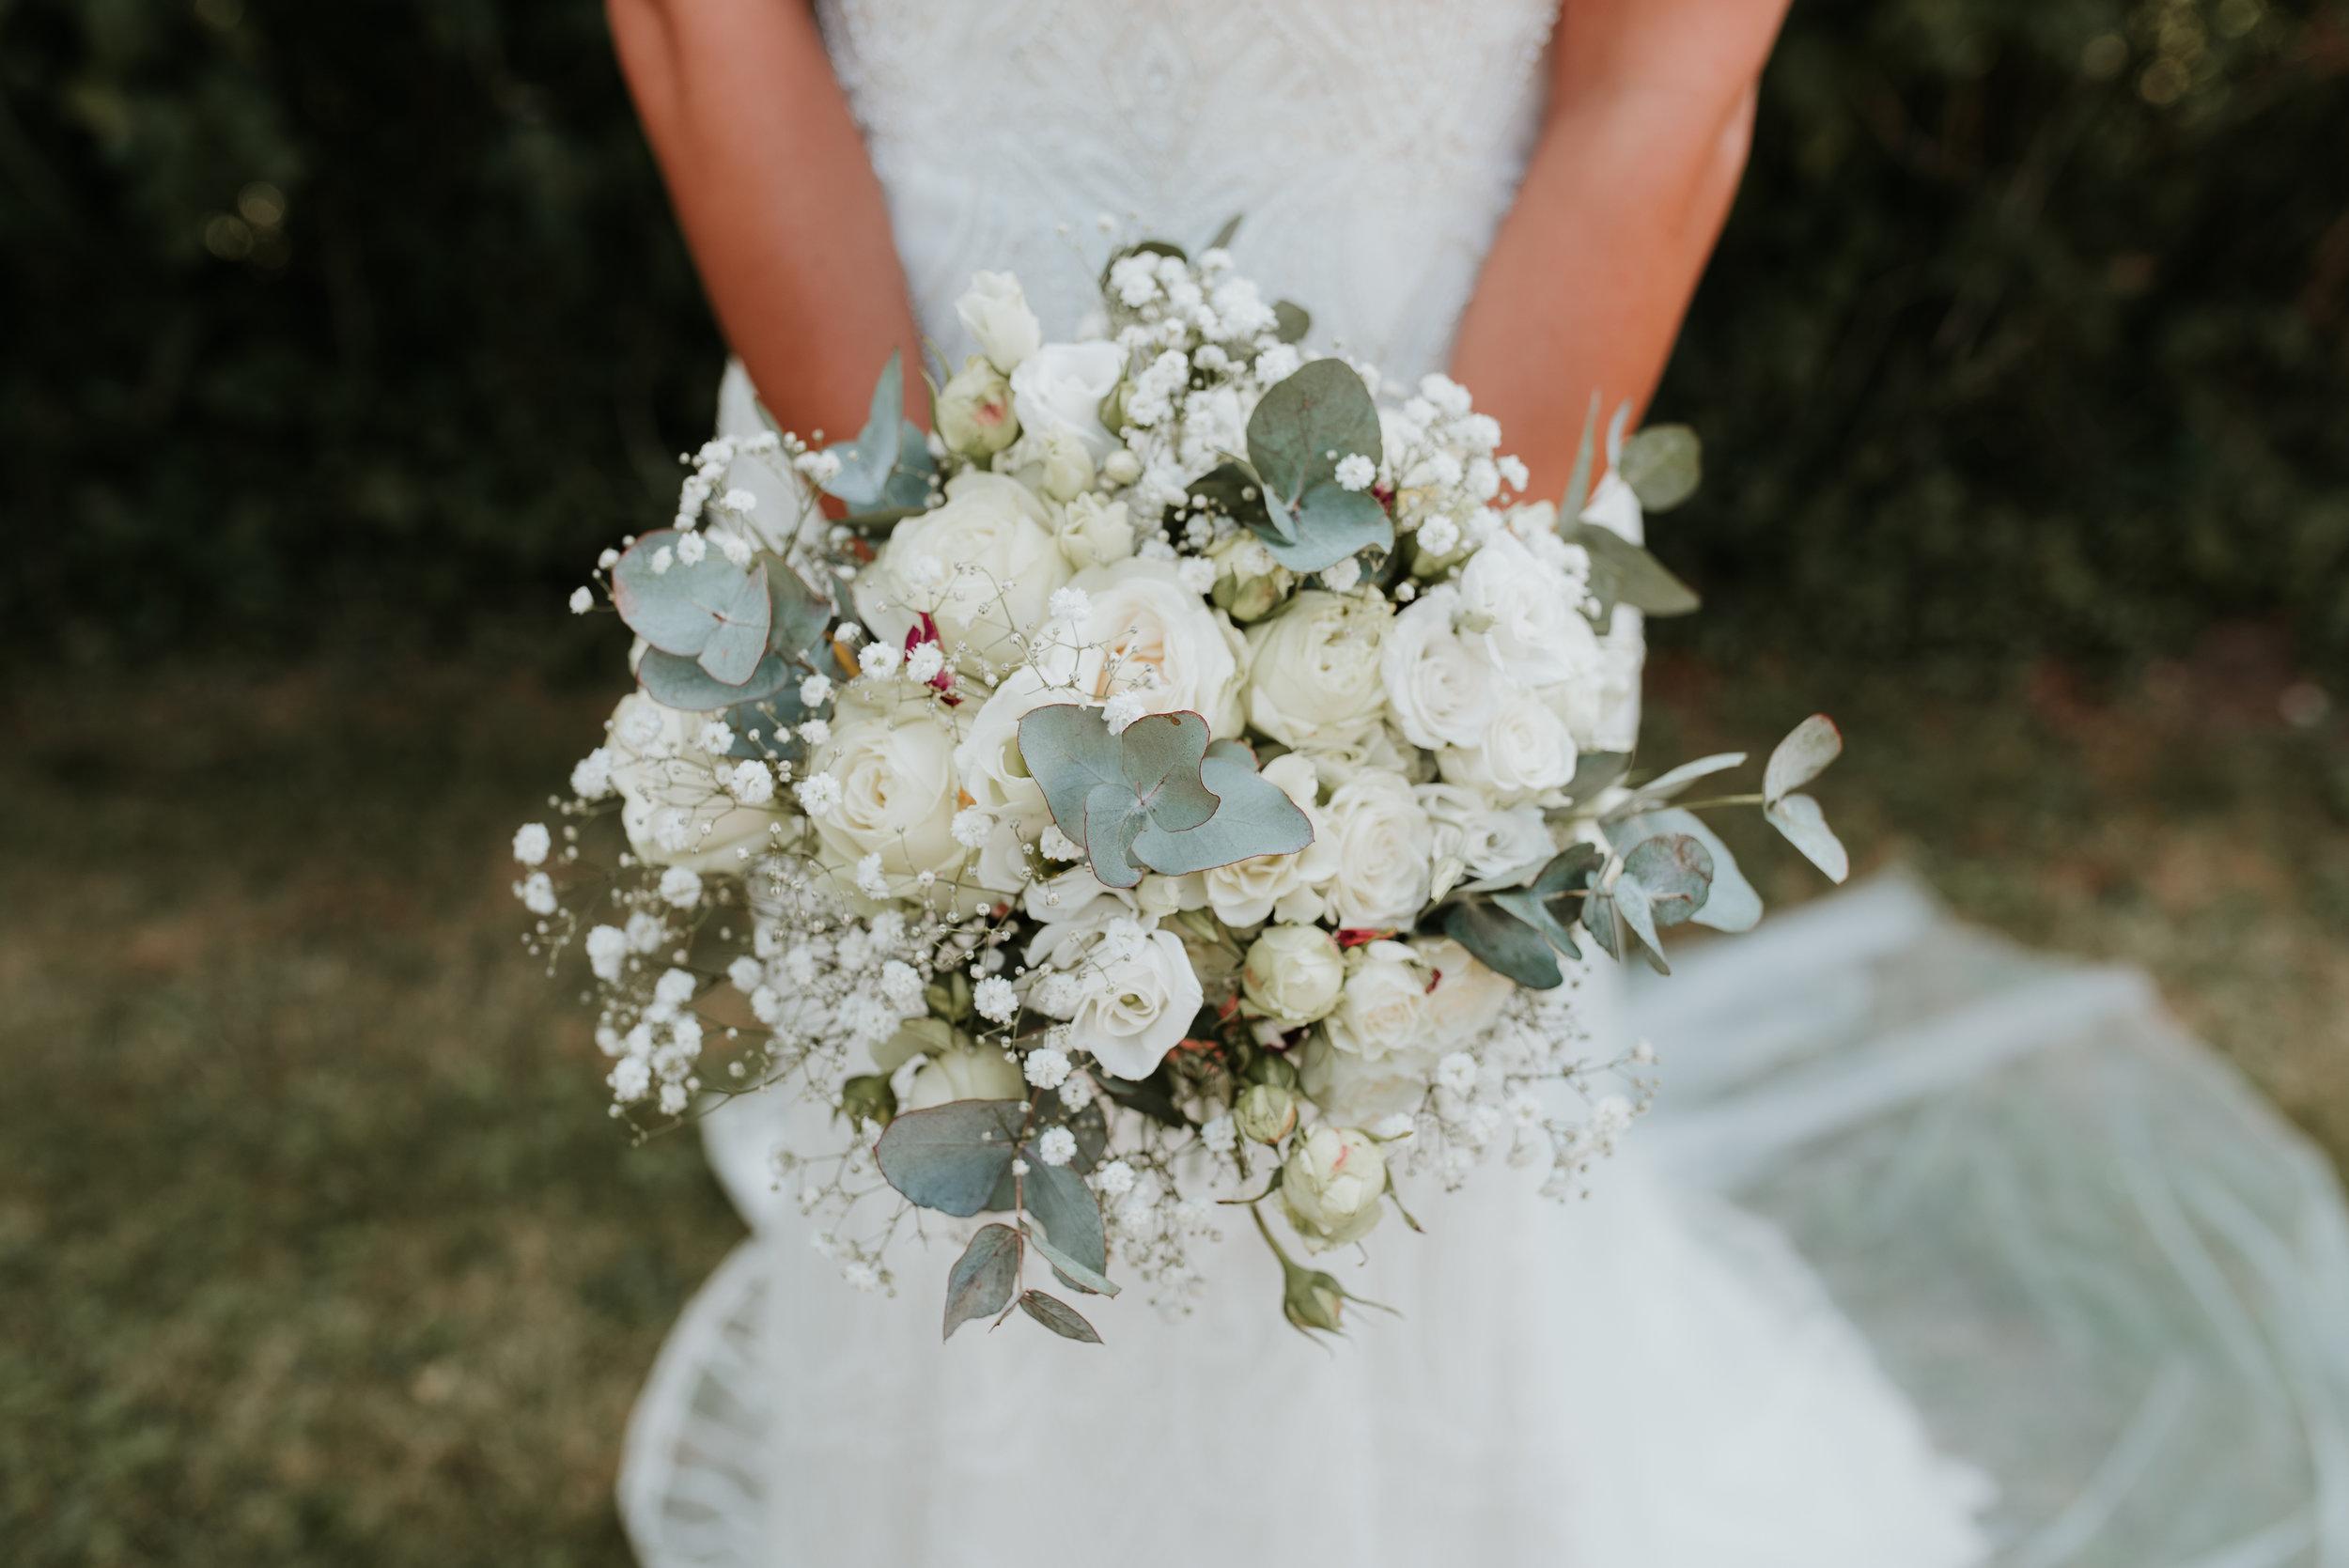 Oxfordshire-wedding-photographer-48.jpg